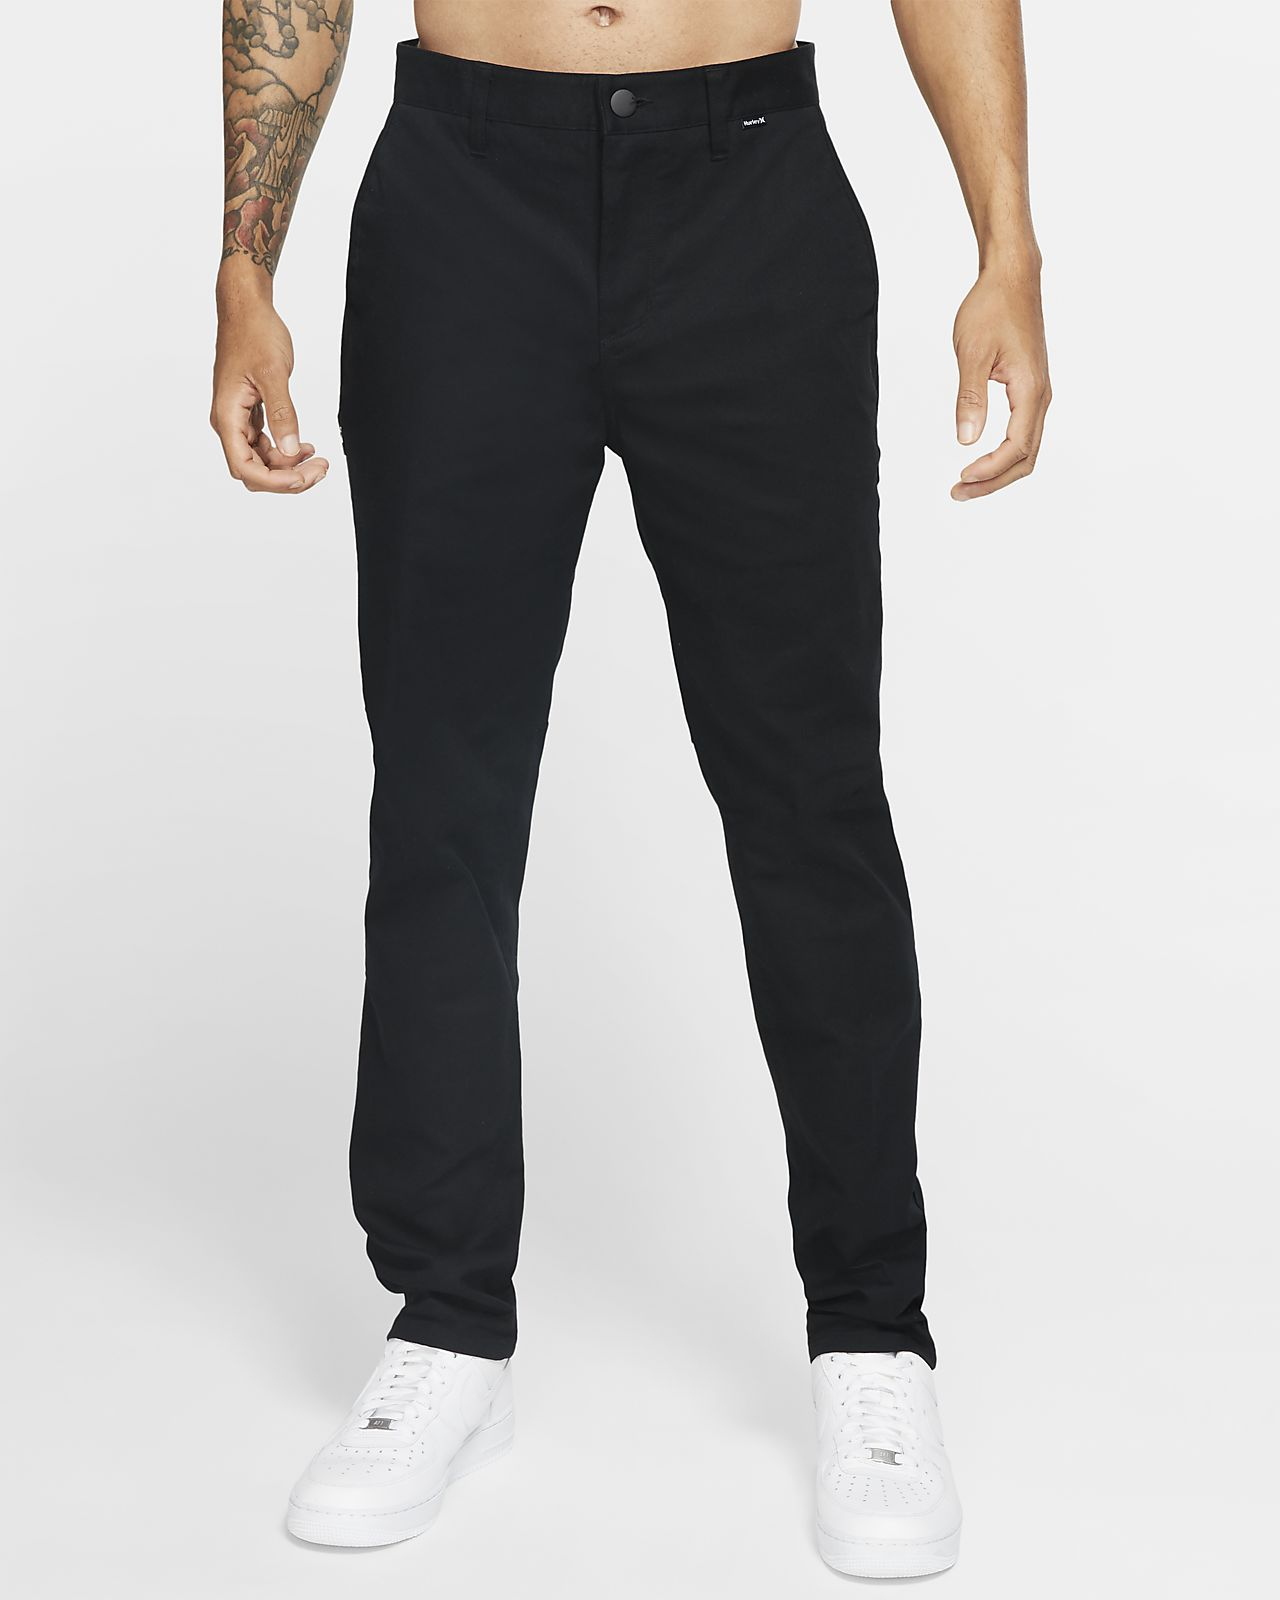 Pantaloni Hurley Roland Sands - Uomo